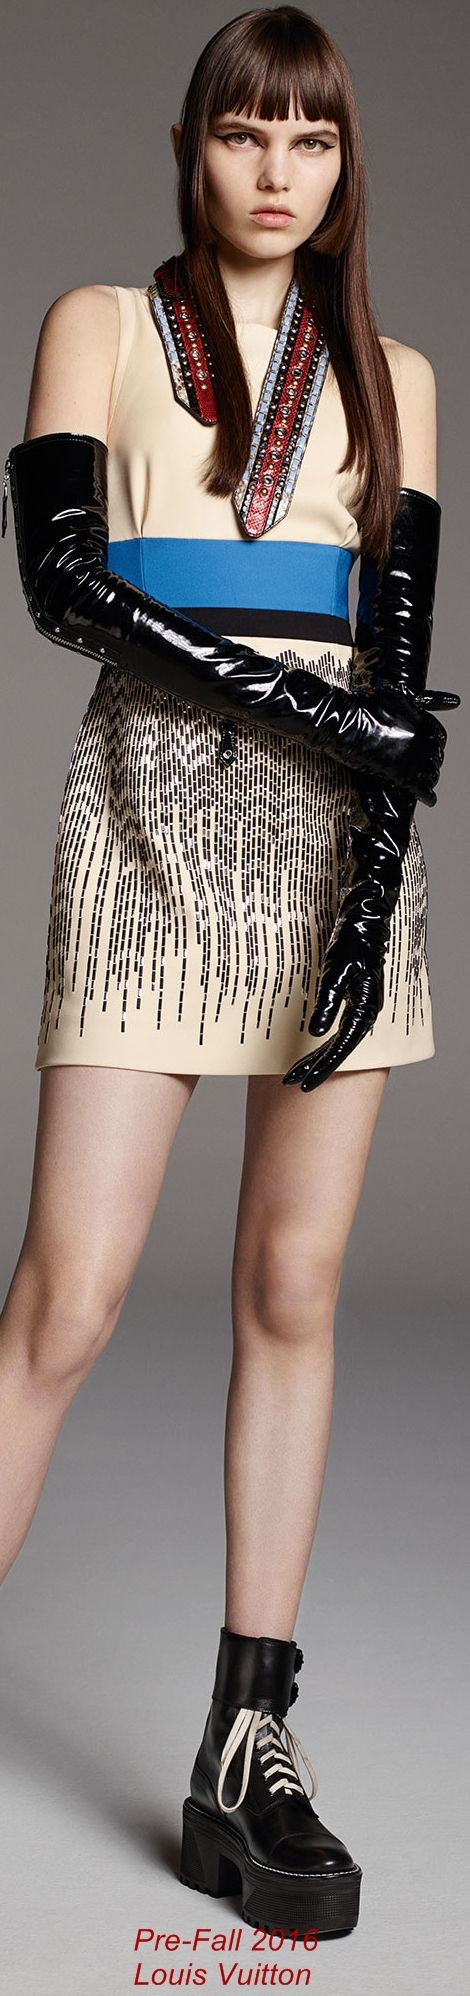 Pre-Fall 2016 Louis Vuitton